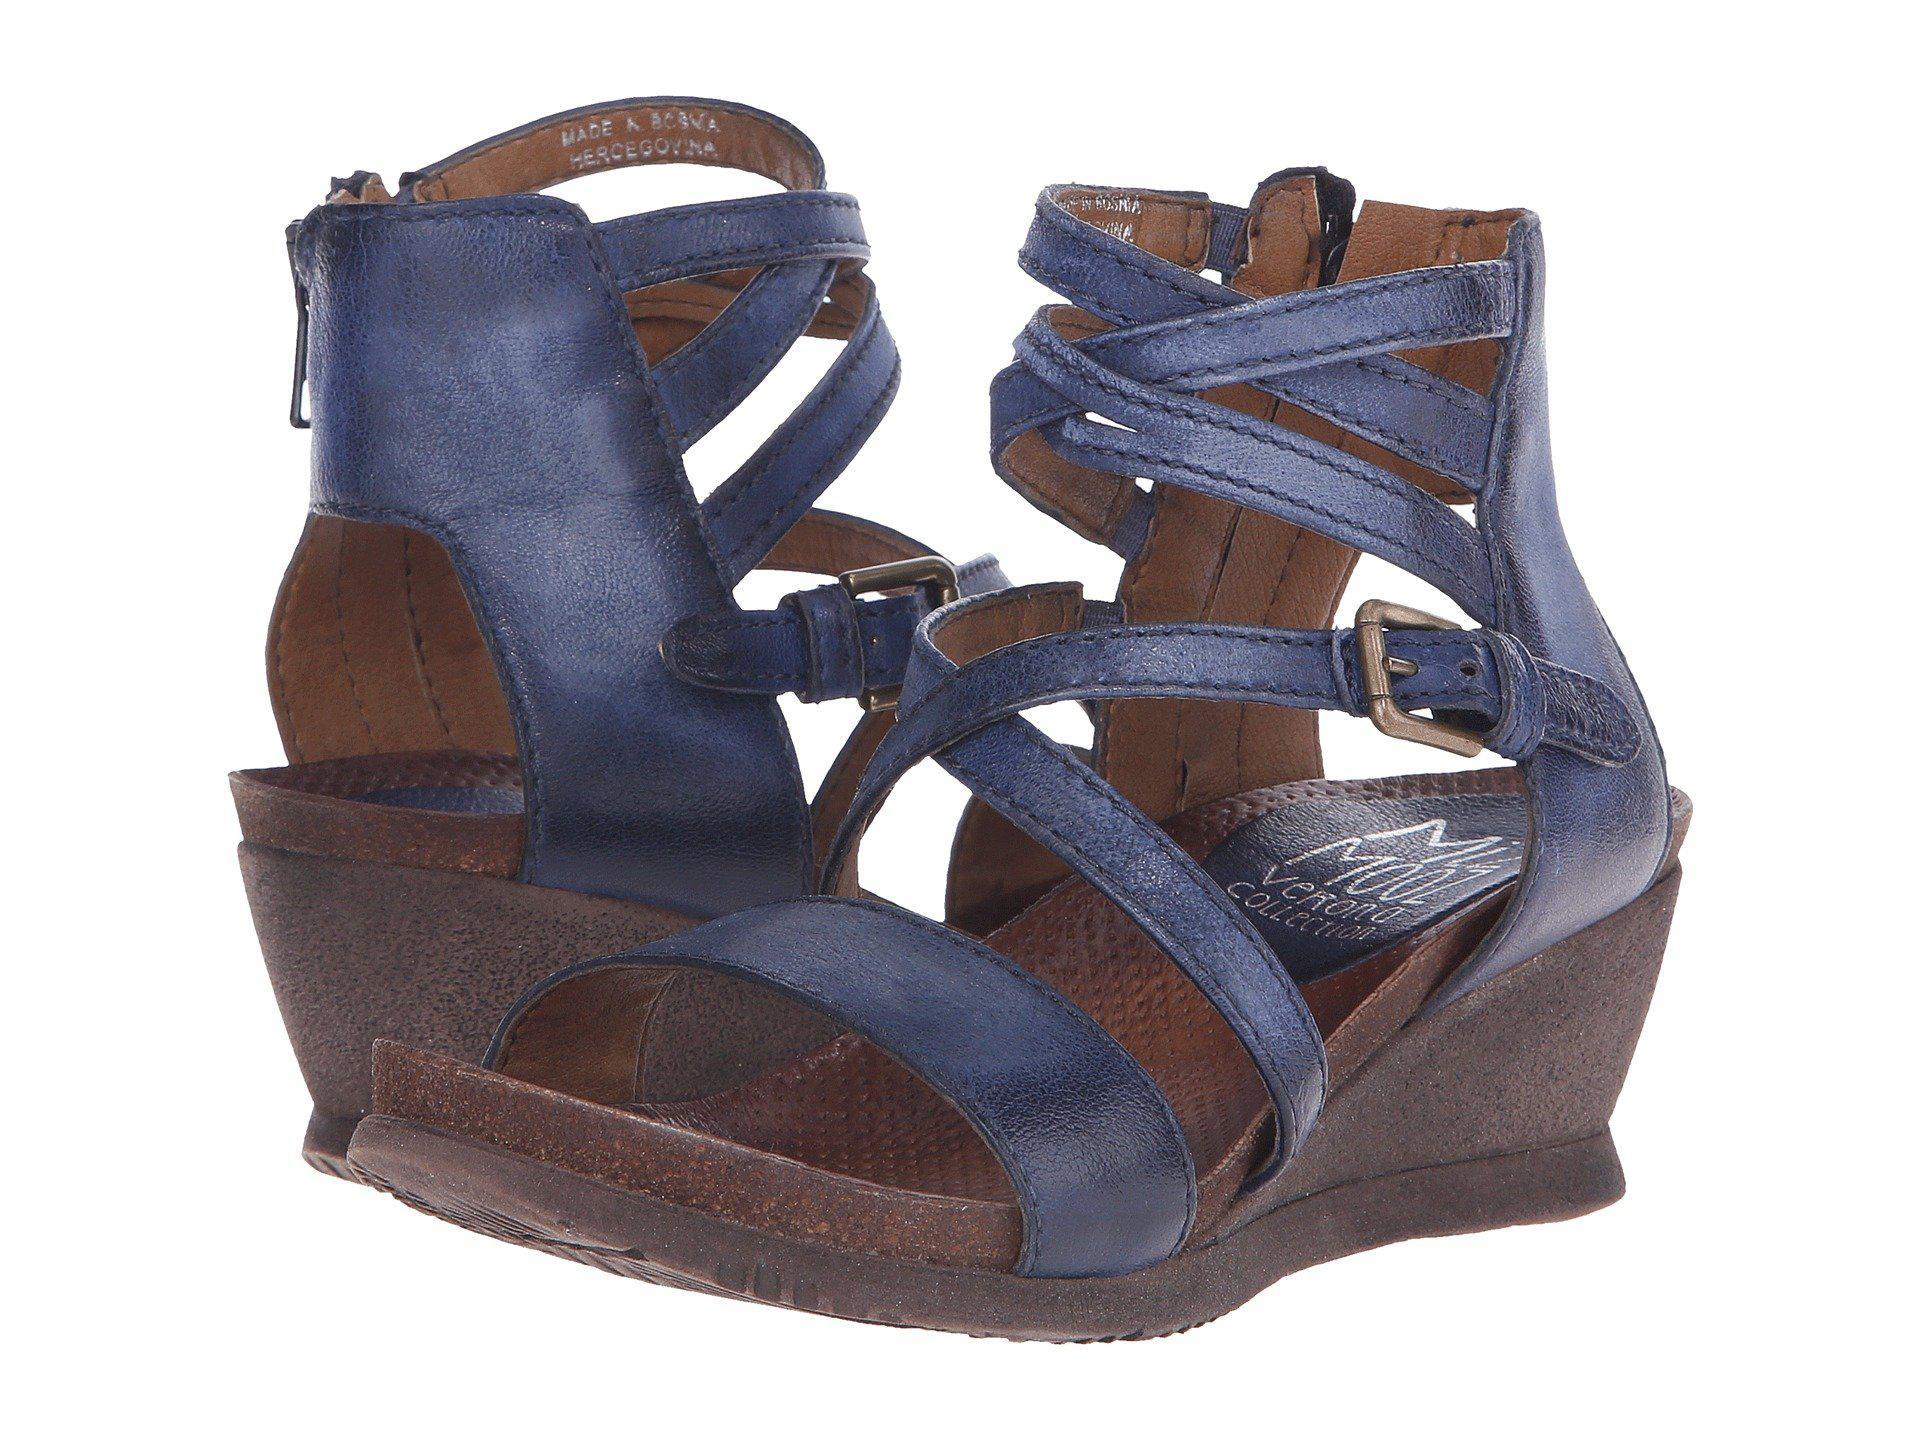 613d7ca69c2d Lyst - Miz Mooz Shay (nickel) Women s Wedge Shoes in Brown